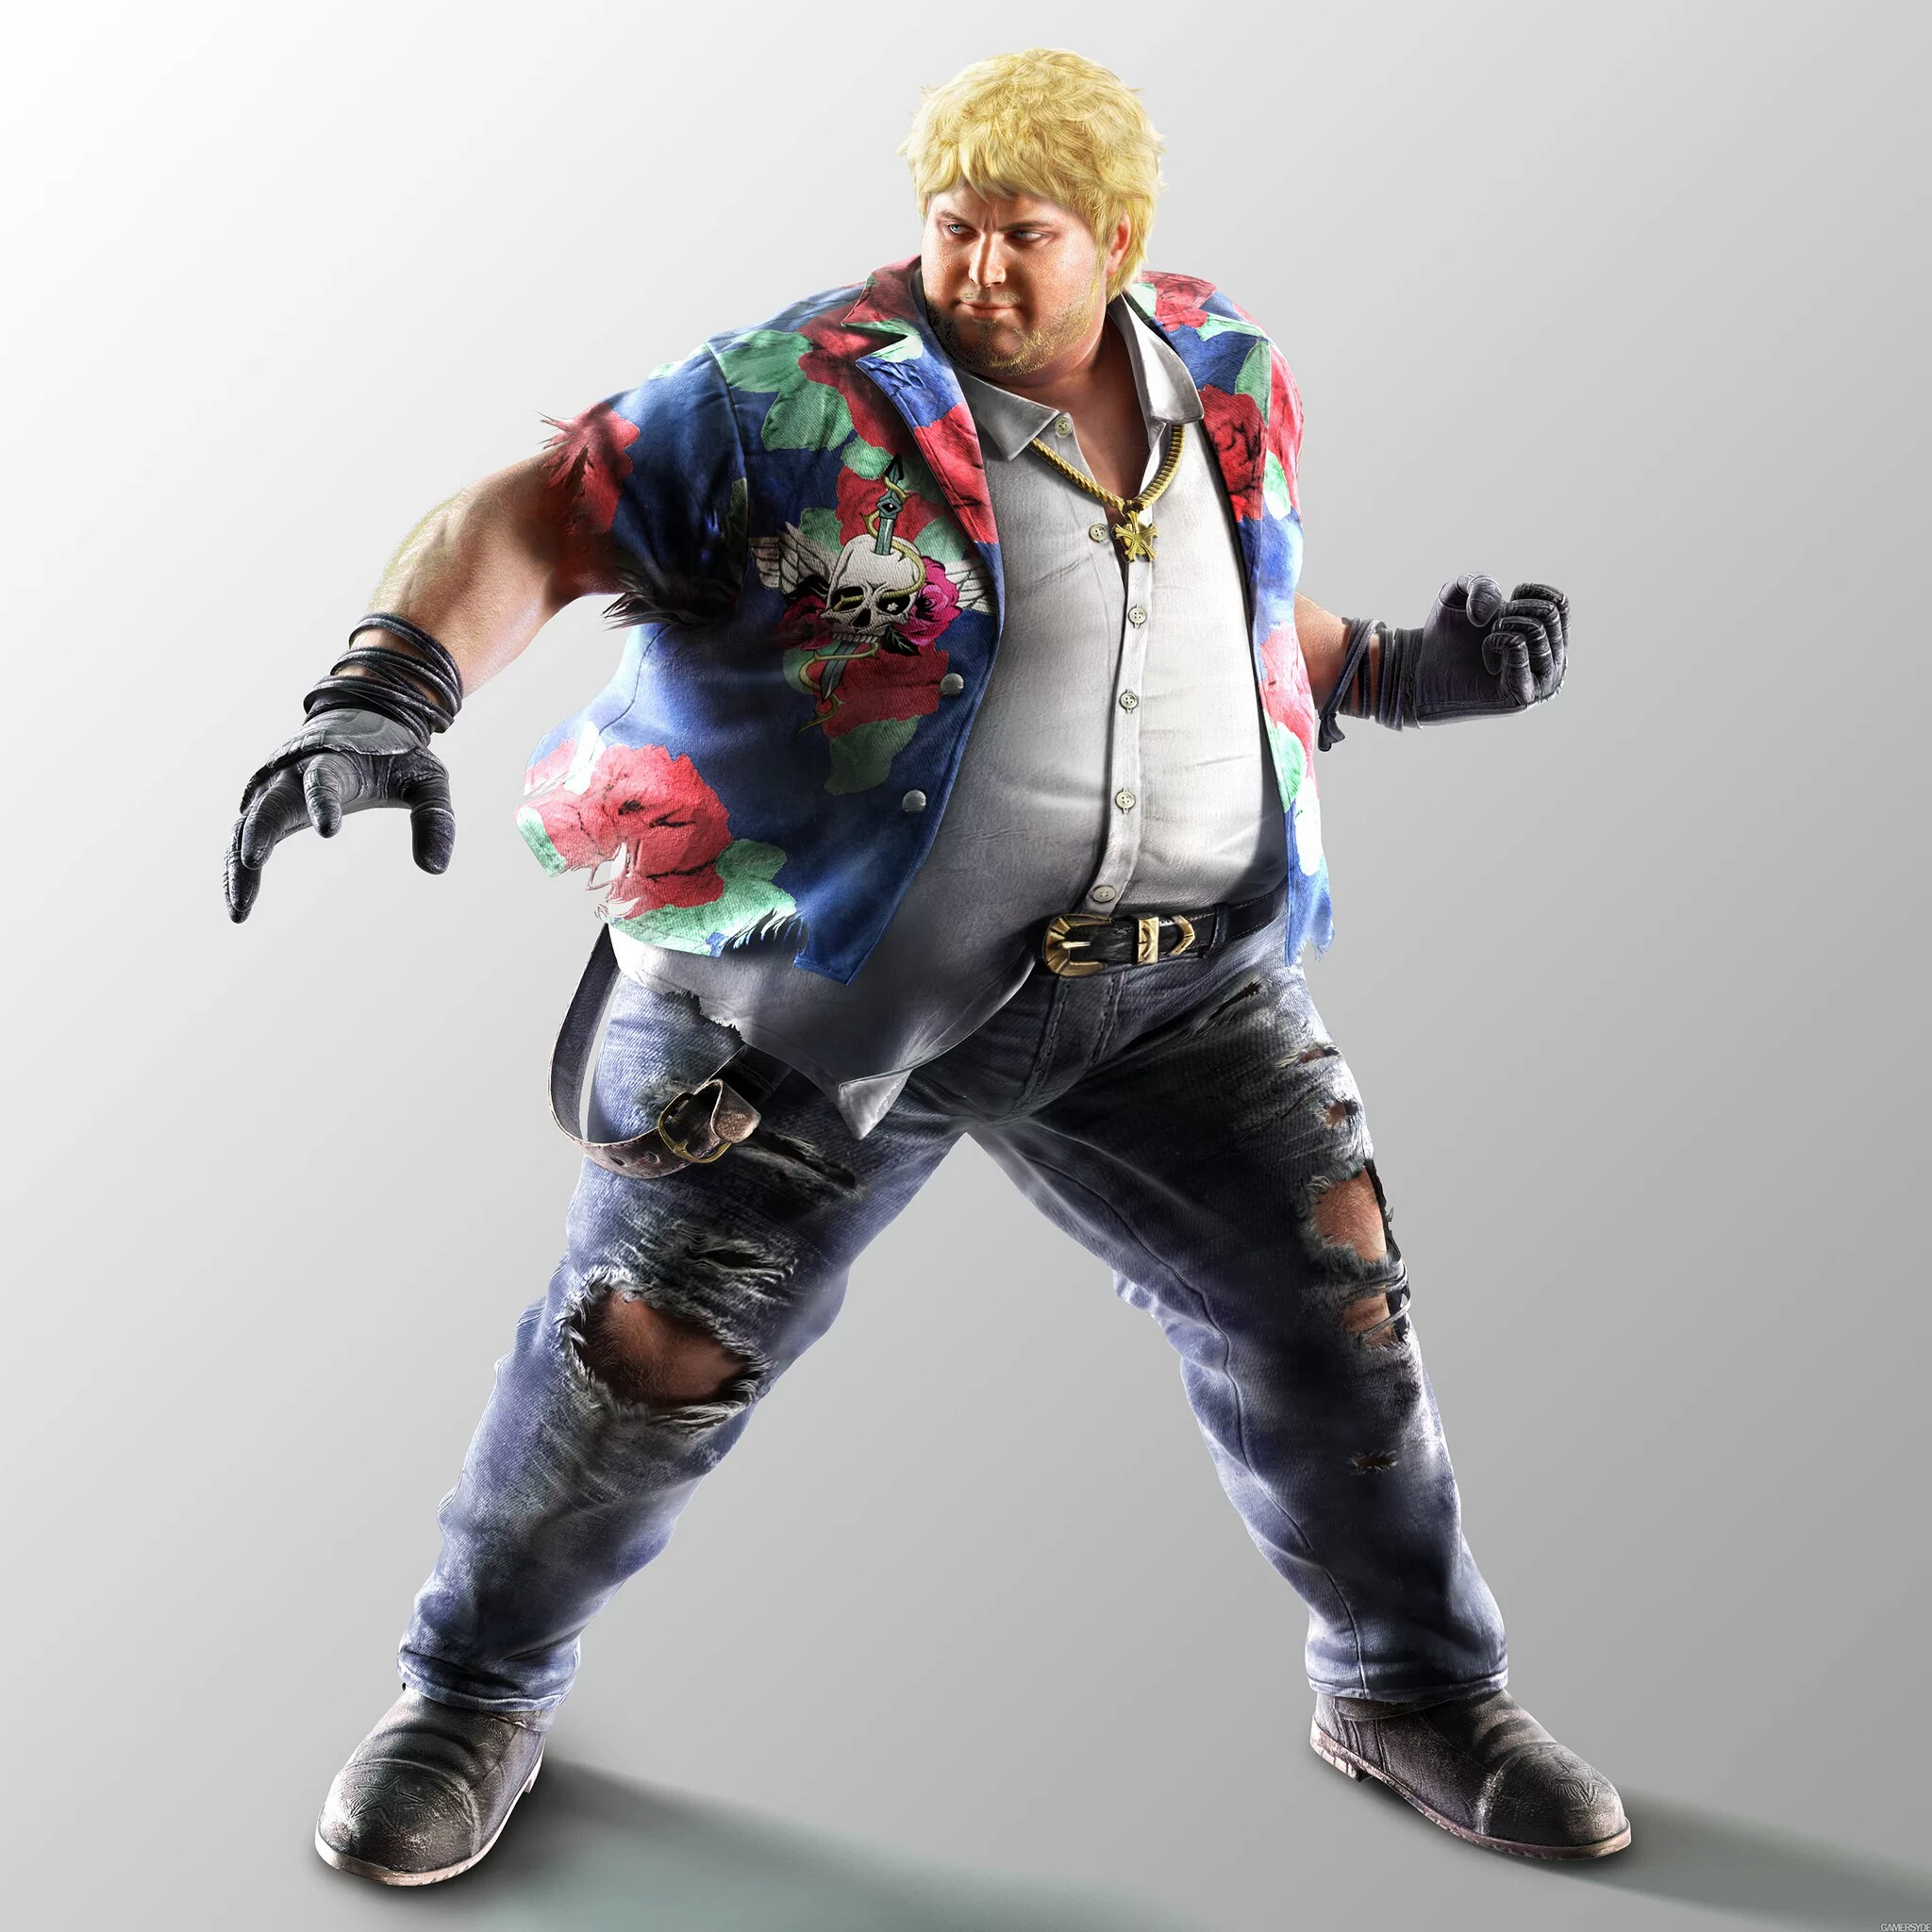 Robert Richards Tekken Wiki Fandom